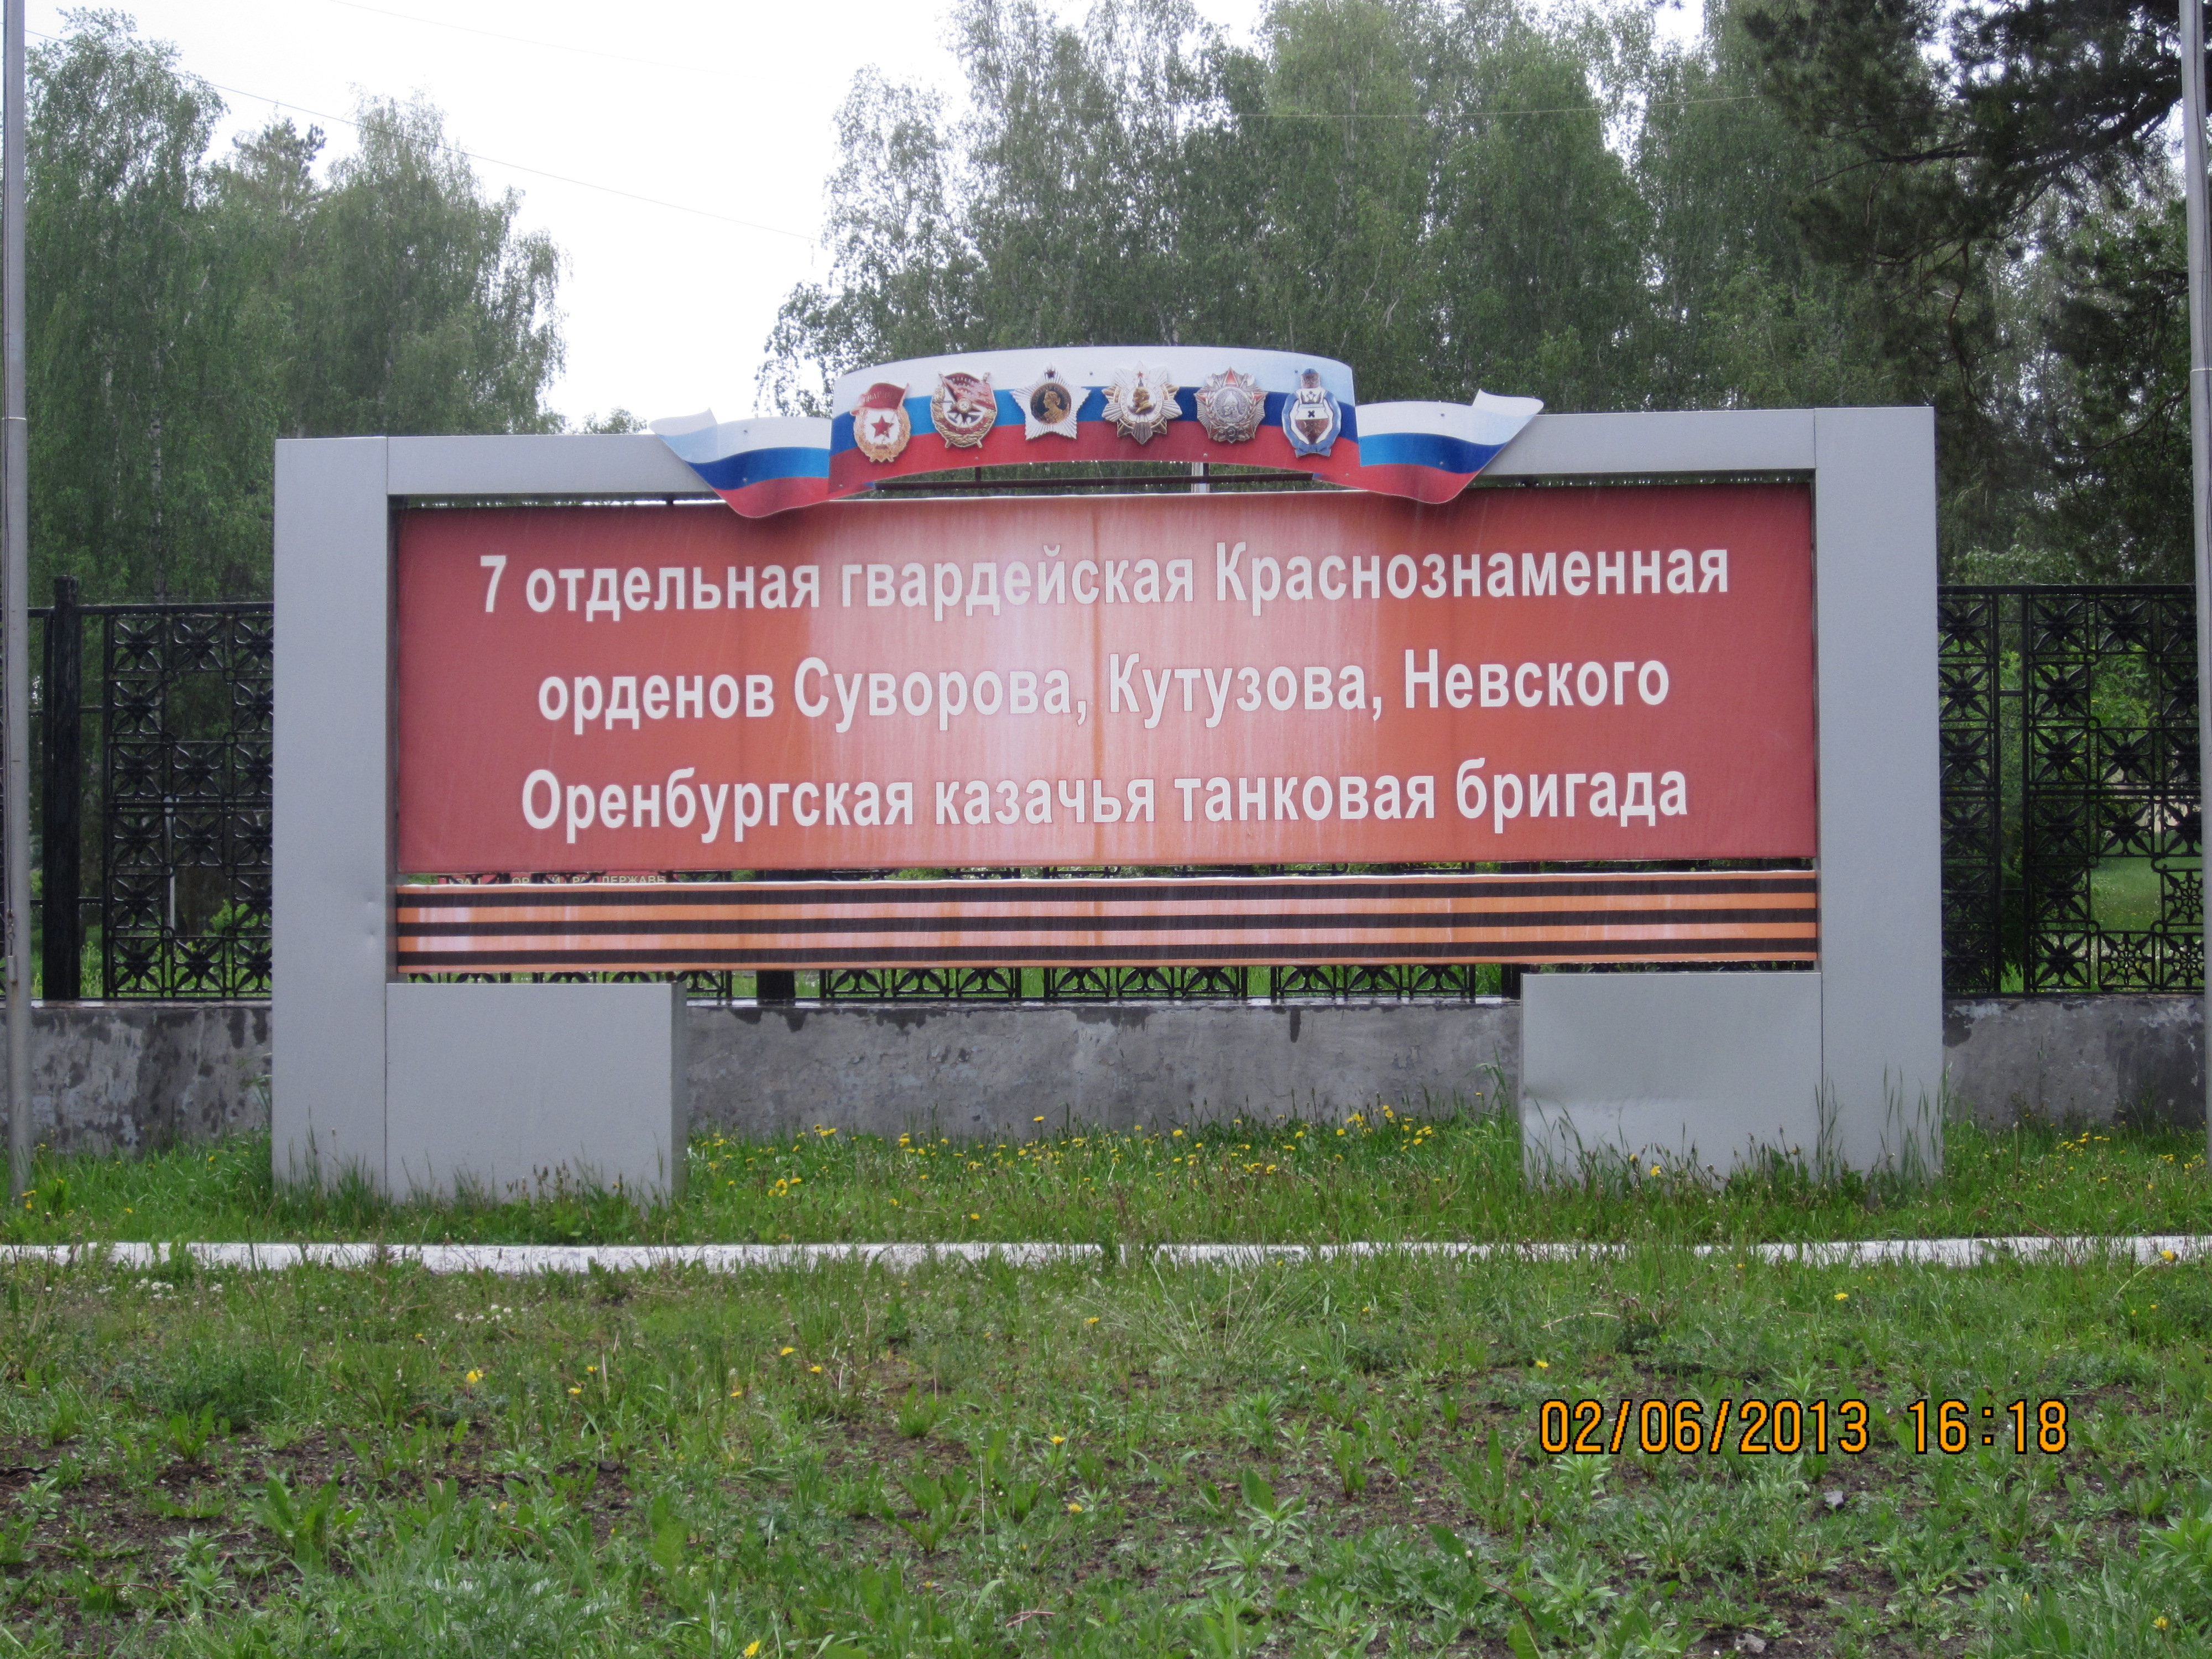 http://s3.uploads.ru/AnF41.jpg